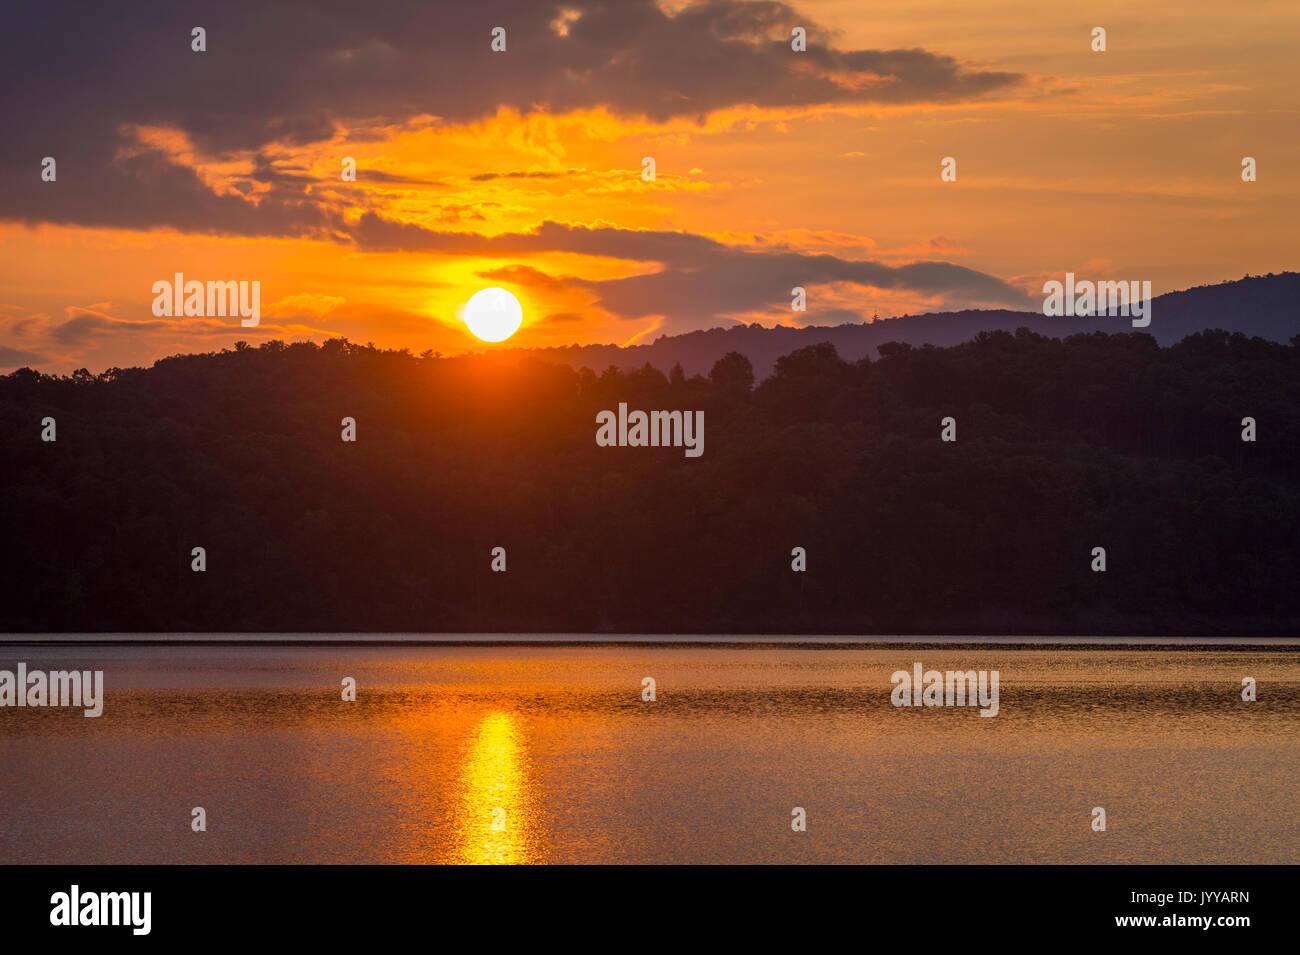 Sunrise On Beautiful Calm Mountain Lake - Stock Image